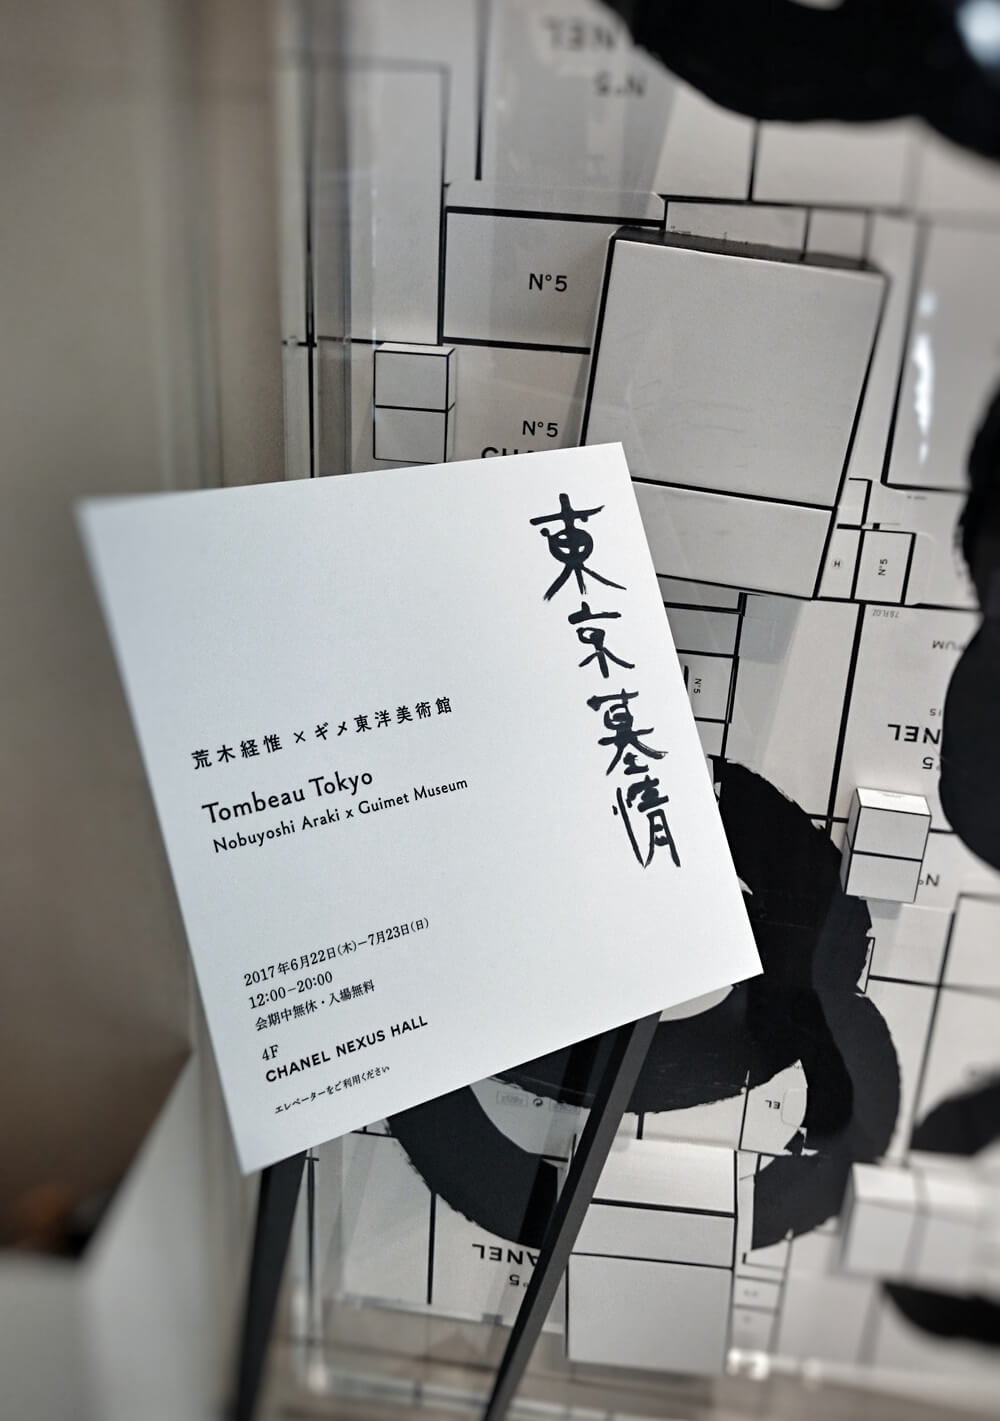 CHANEL シャネル 東京墓情 荒木経惟×ギメ東洋美術館